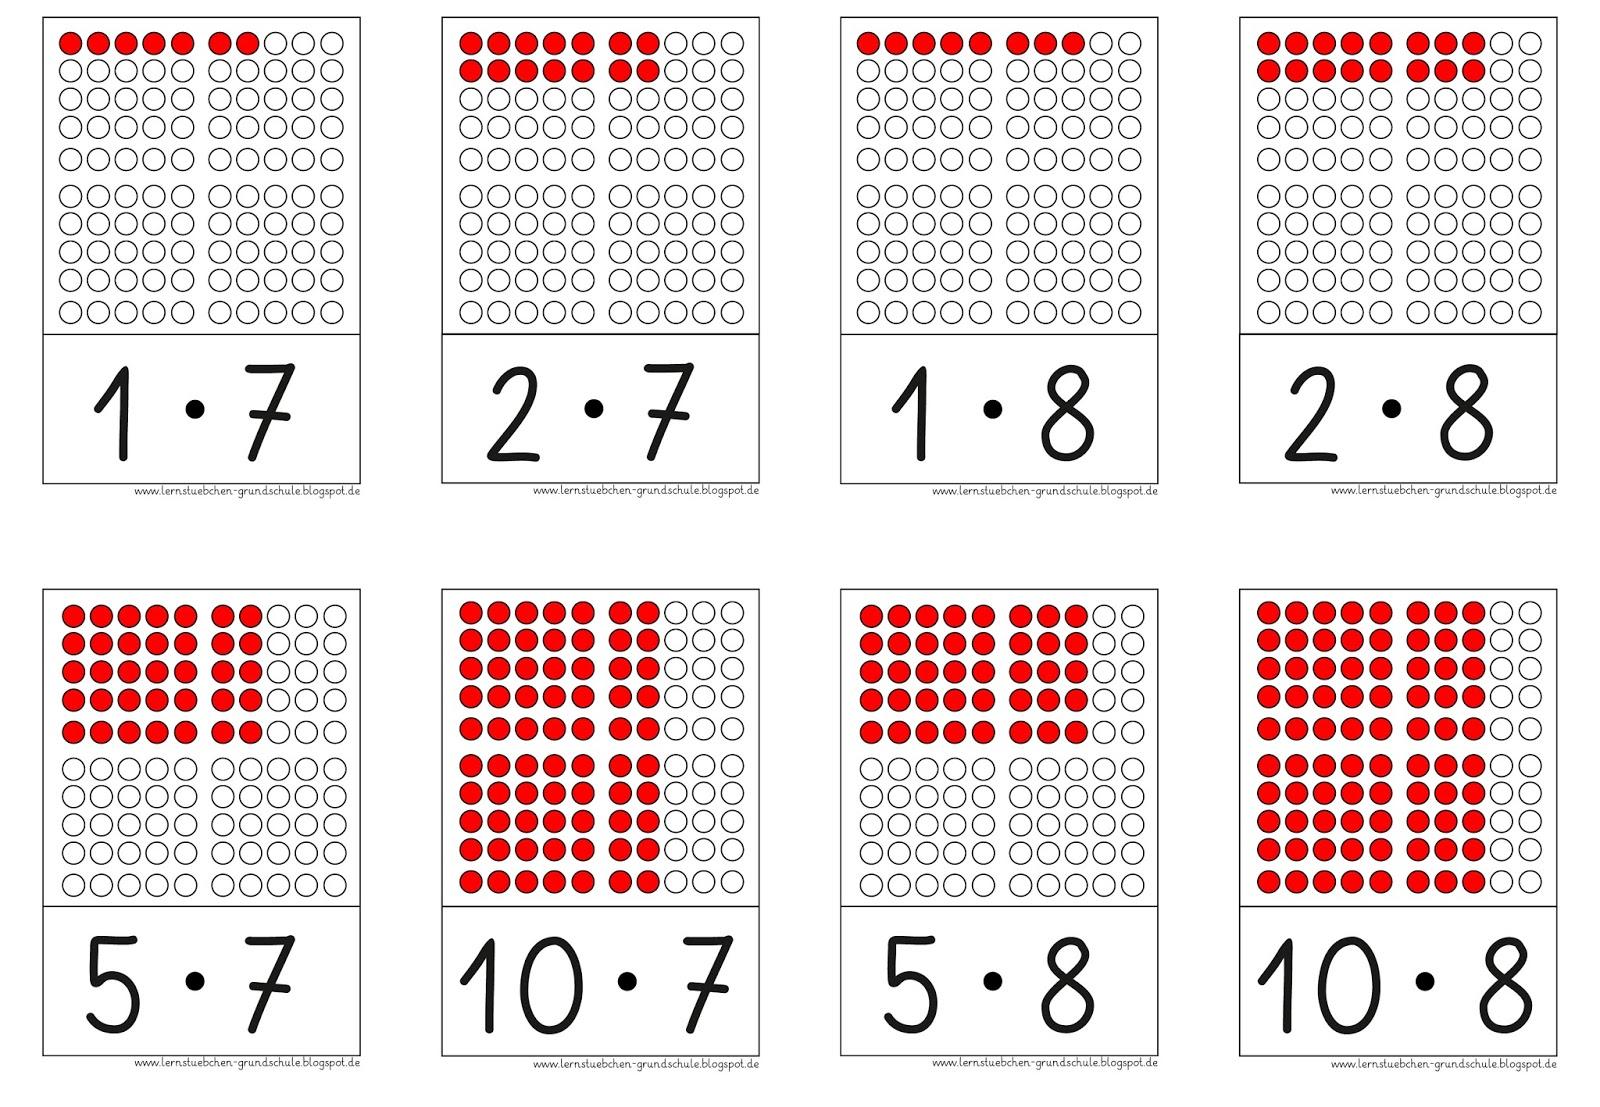 Erfreut Symmetrische Muster Arbeitsblatt Ks1 Galerie - Super Lehrer ...